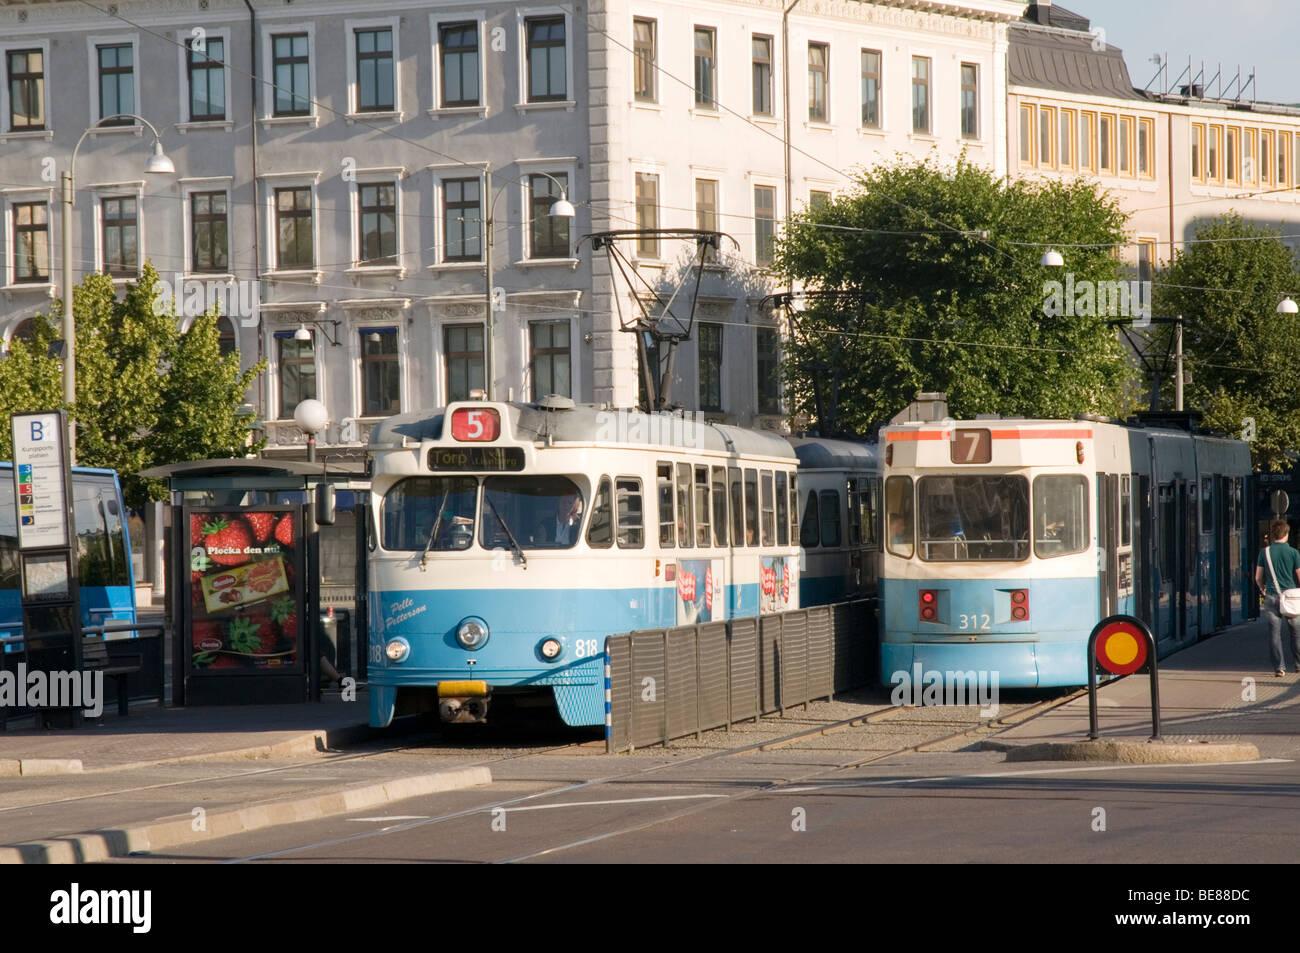 tram trams system public transport gothenburg Göteborg sweden swedish city sverige street town streets transportation - Stock Image